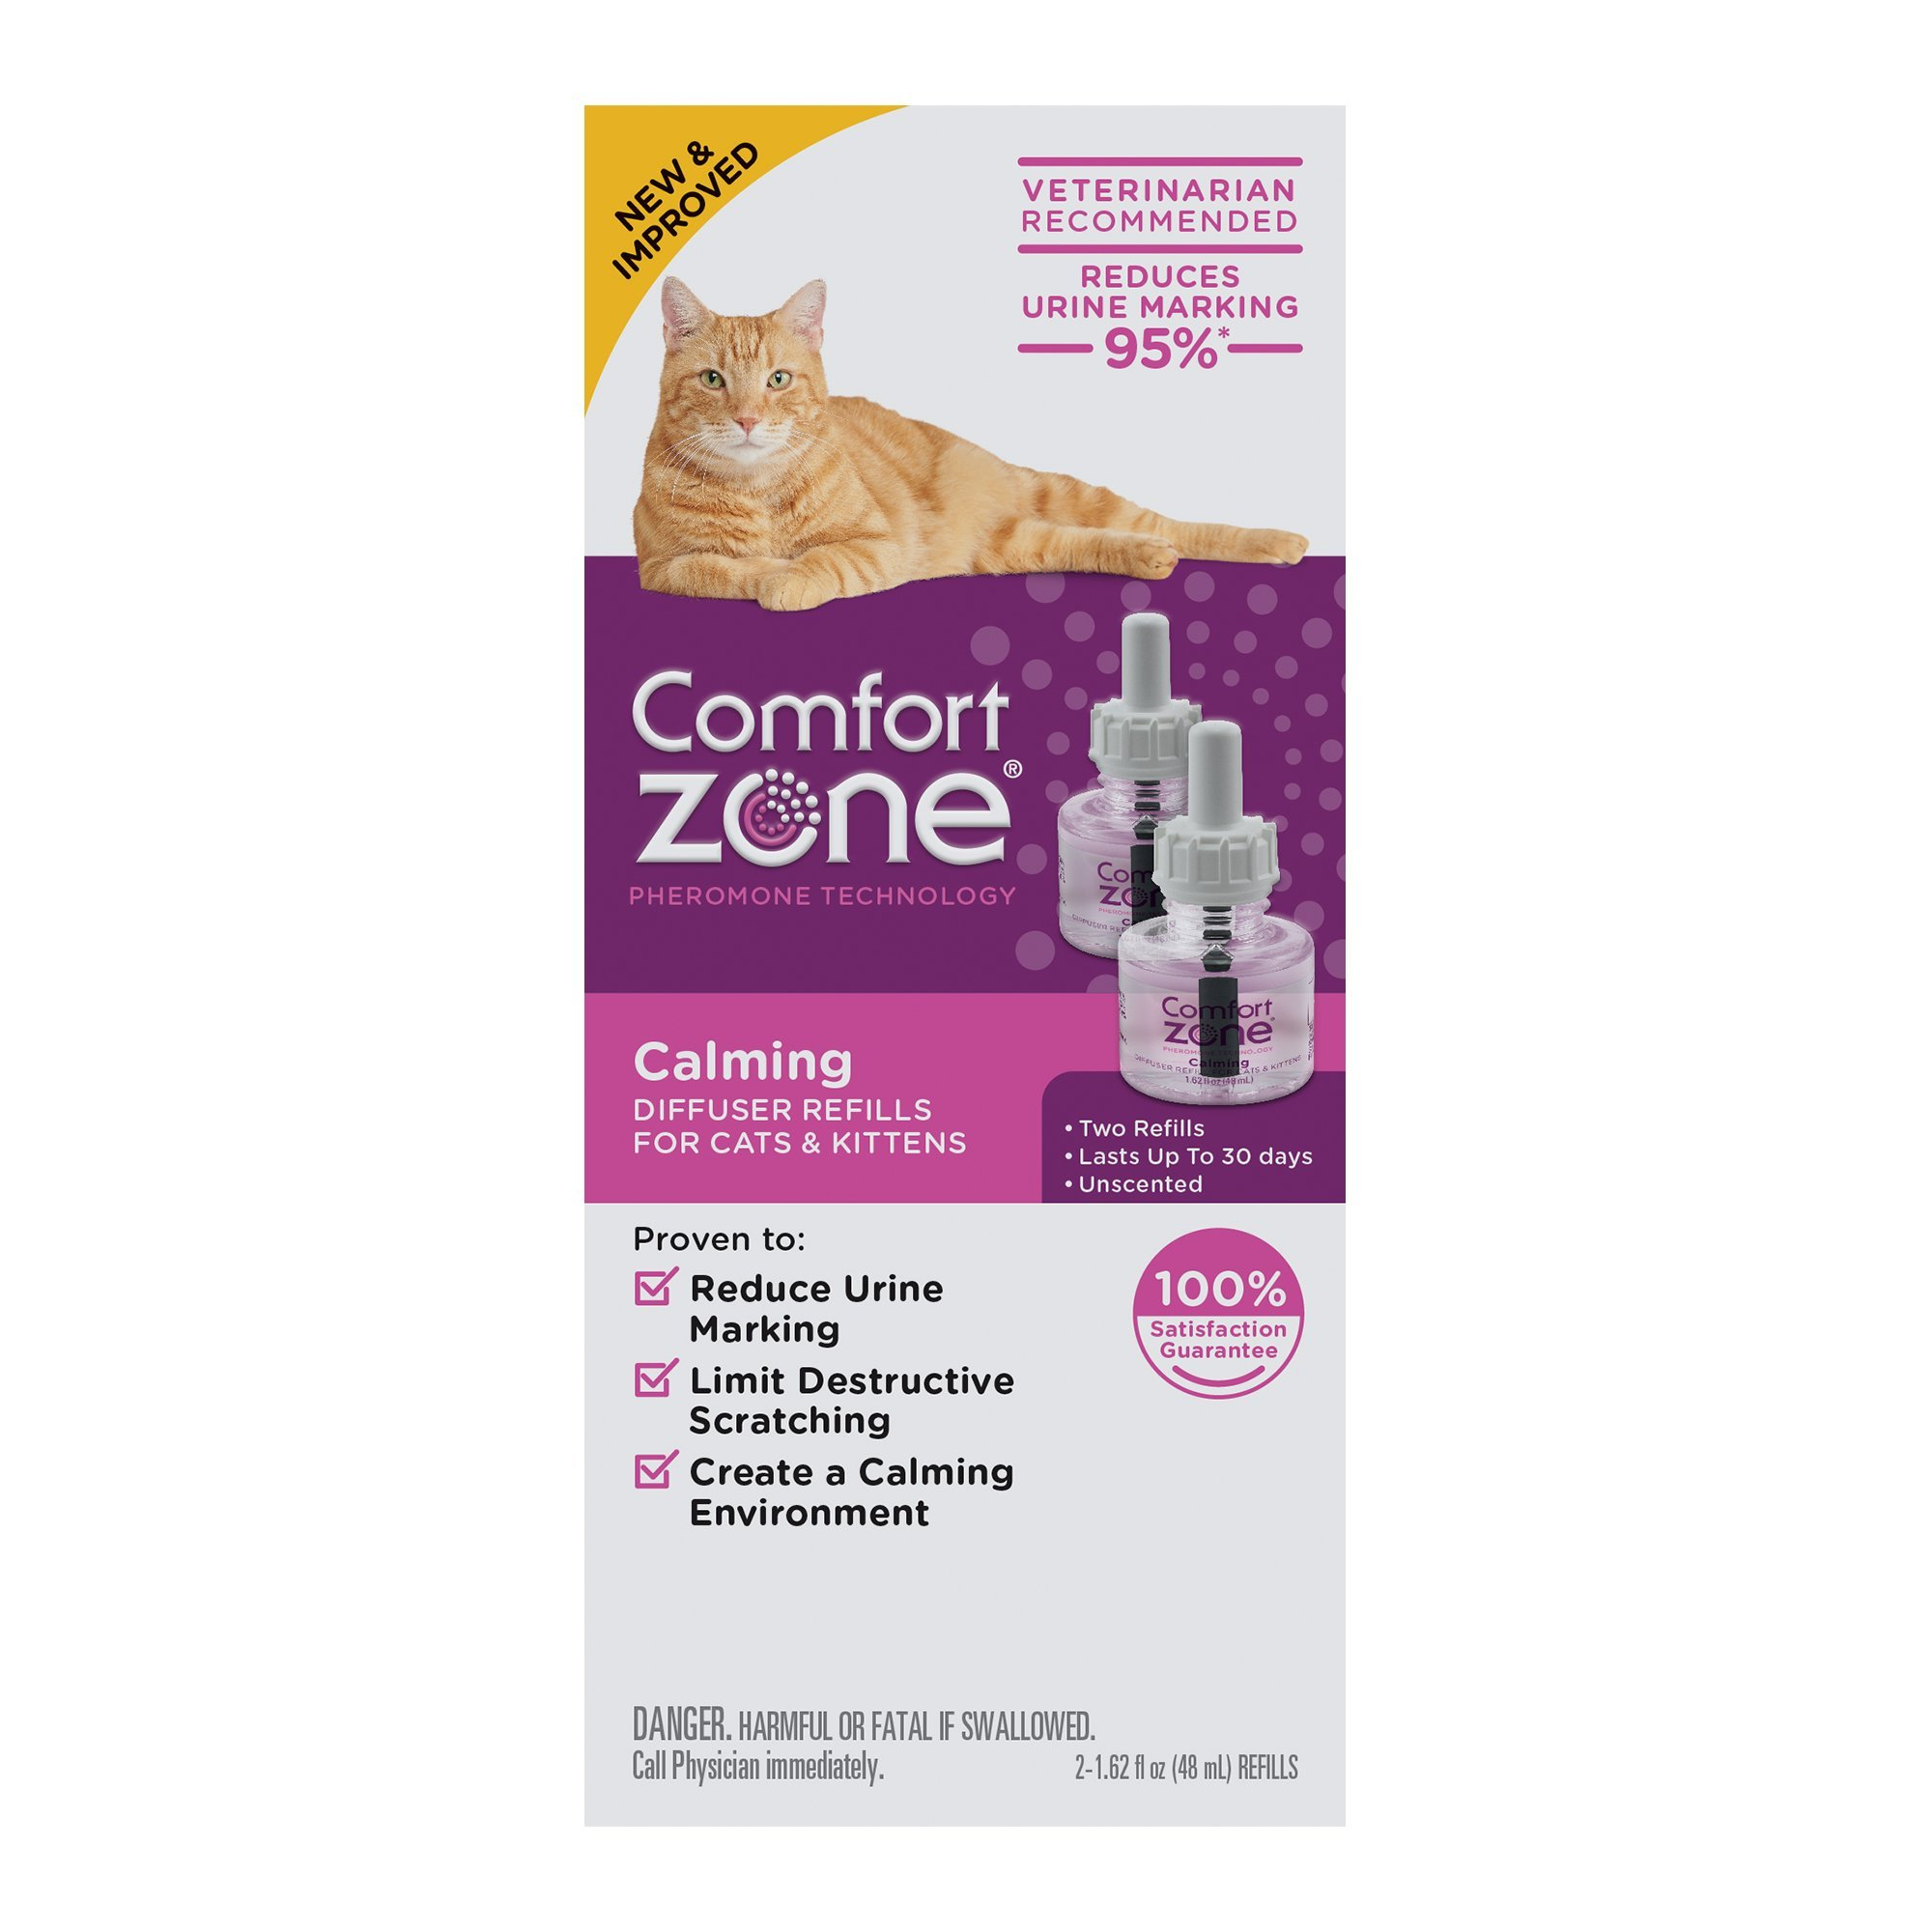 Comfort Zone Calming Refill for Cat, 1.62 fl. oz., Pack of 2